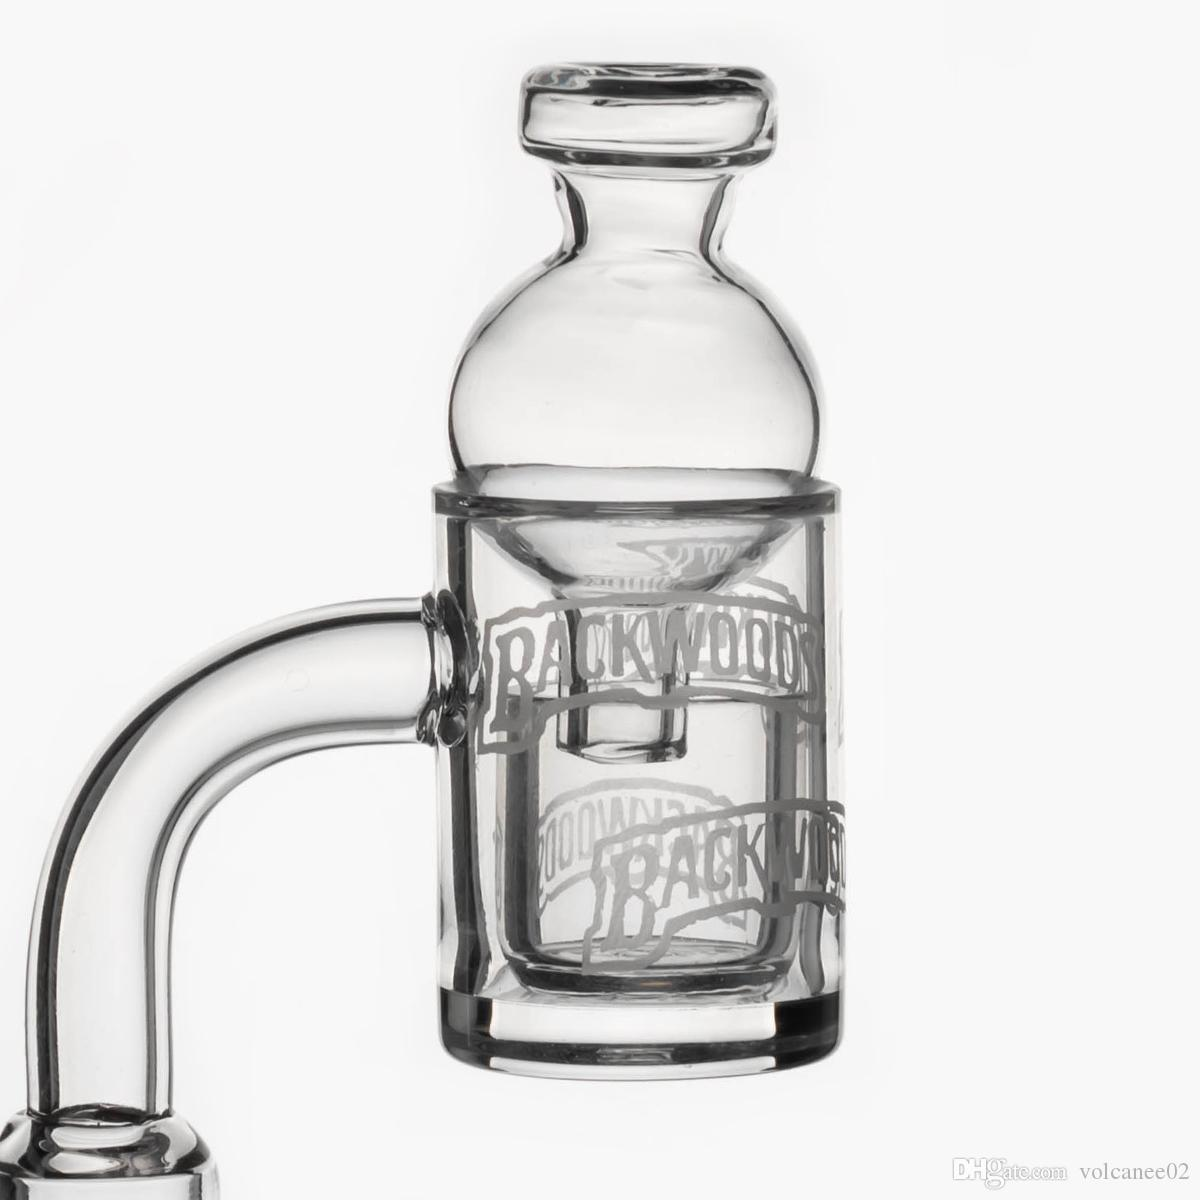 Design de cachimbo de água chanfrado de quartzo banger 25mm unhas inserir + tampa de carb de vidro para bongs Dab Rig